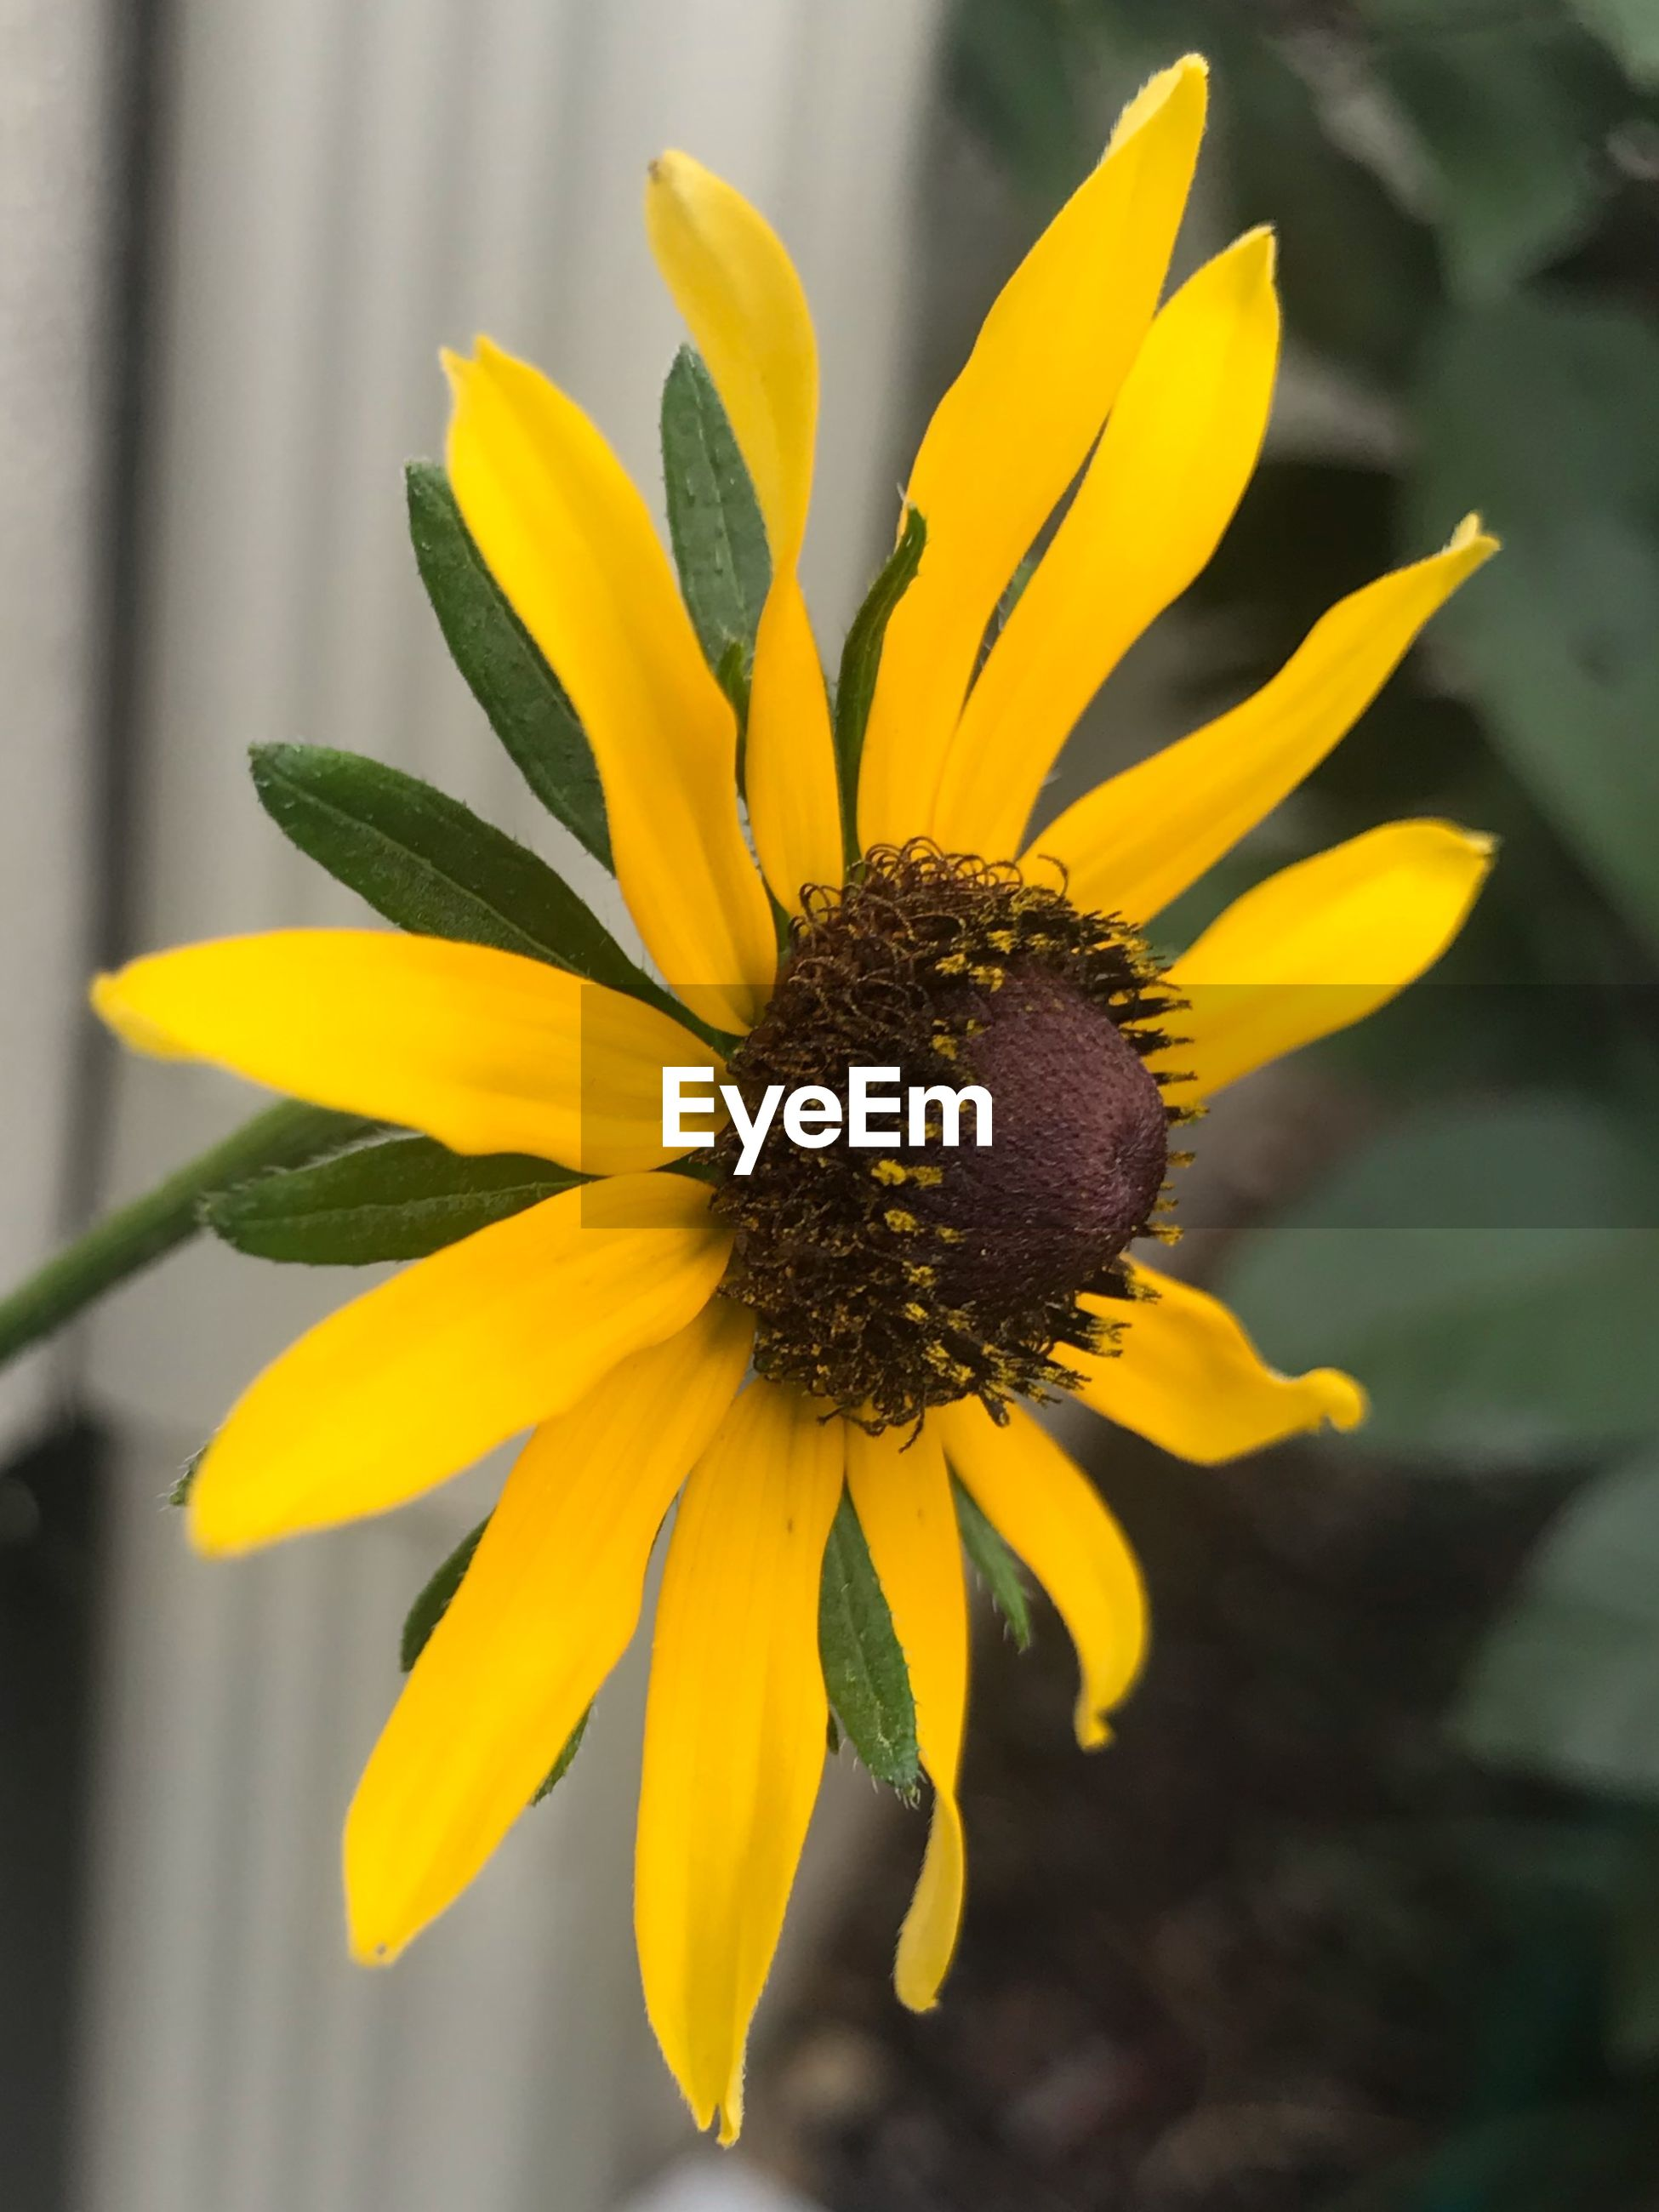 CLOSE-UP OF YELLOW DANDELION FLOWER